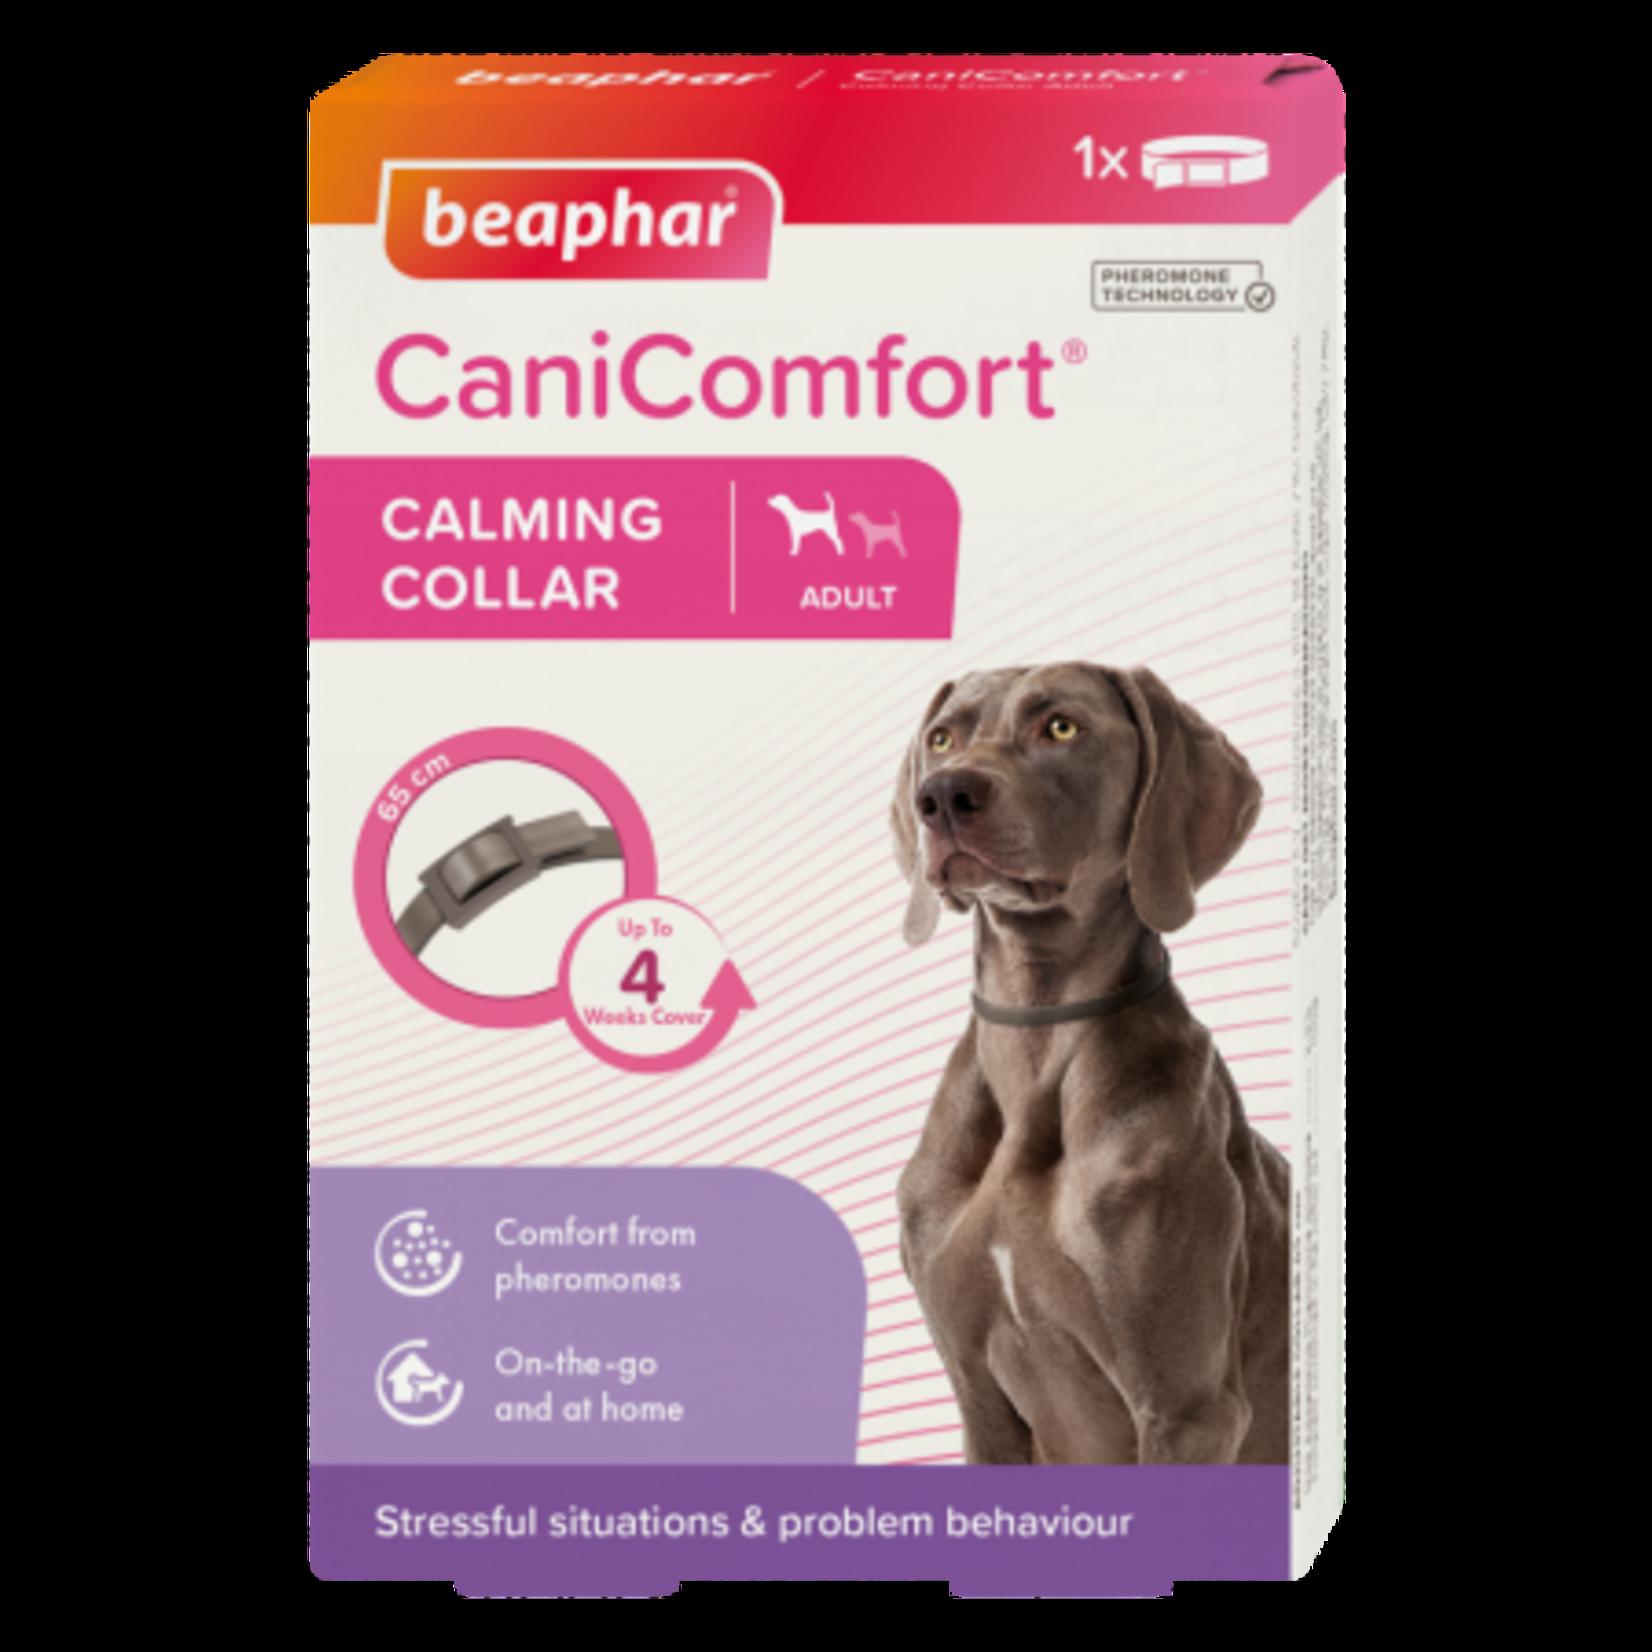 Beaphar CaniComfort Calming Collar with Dog Appeasing Pheromones